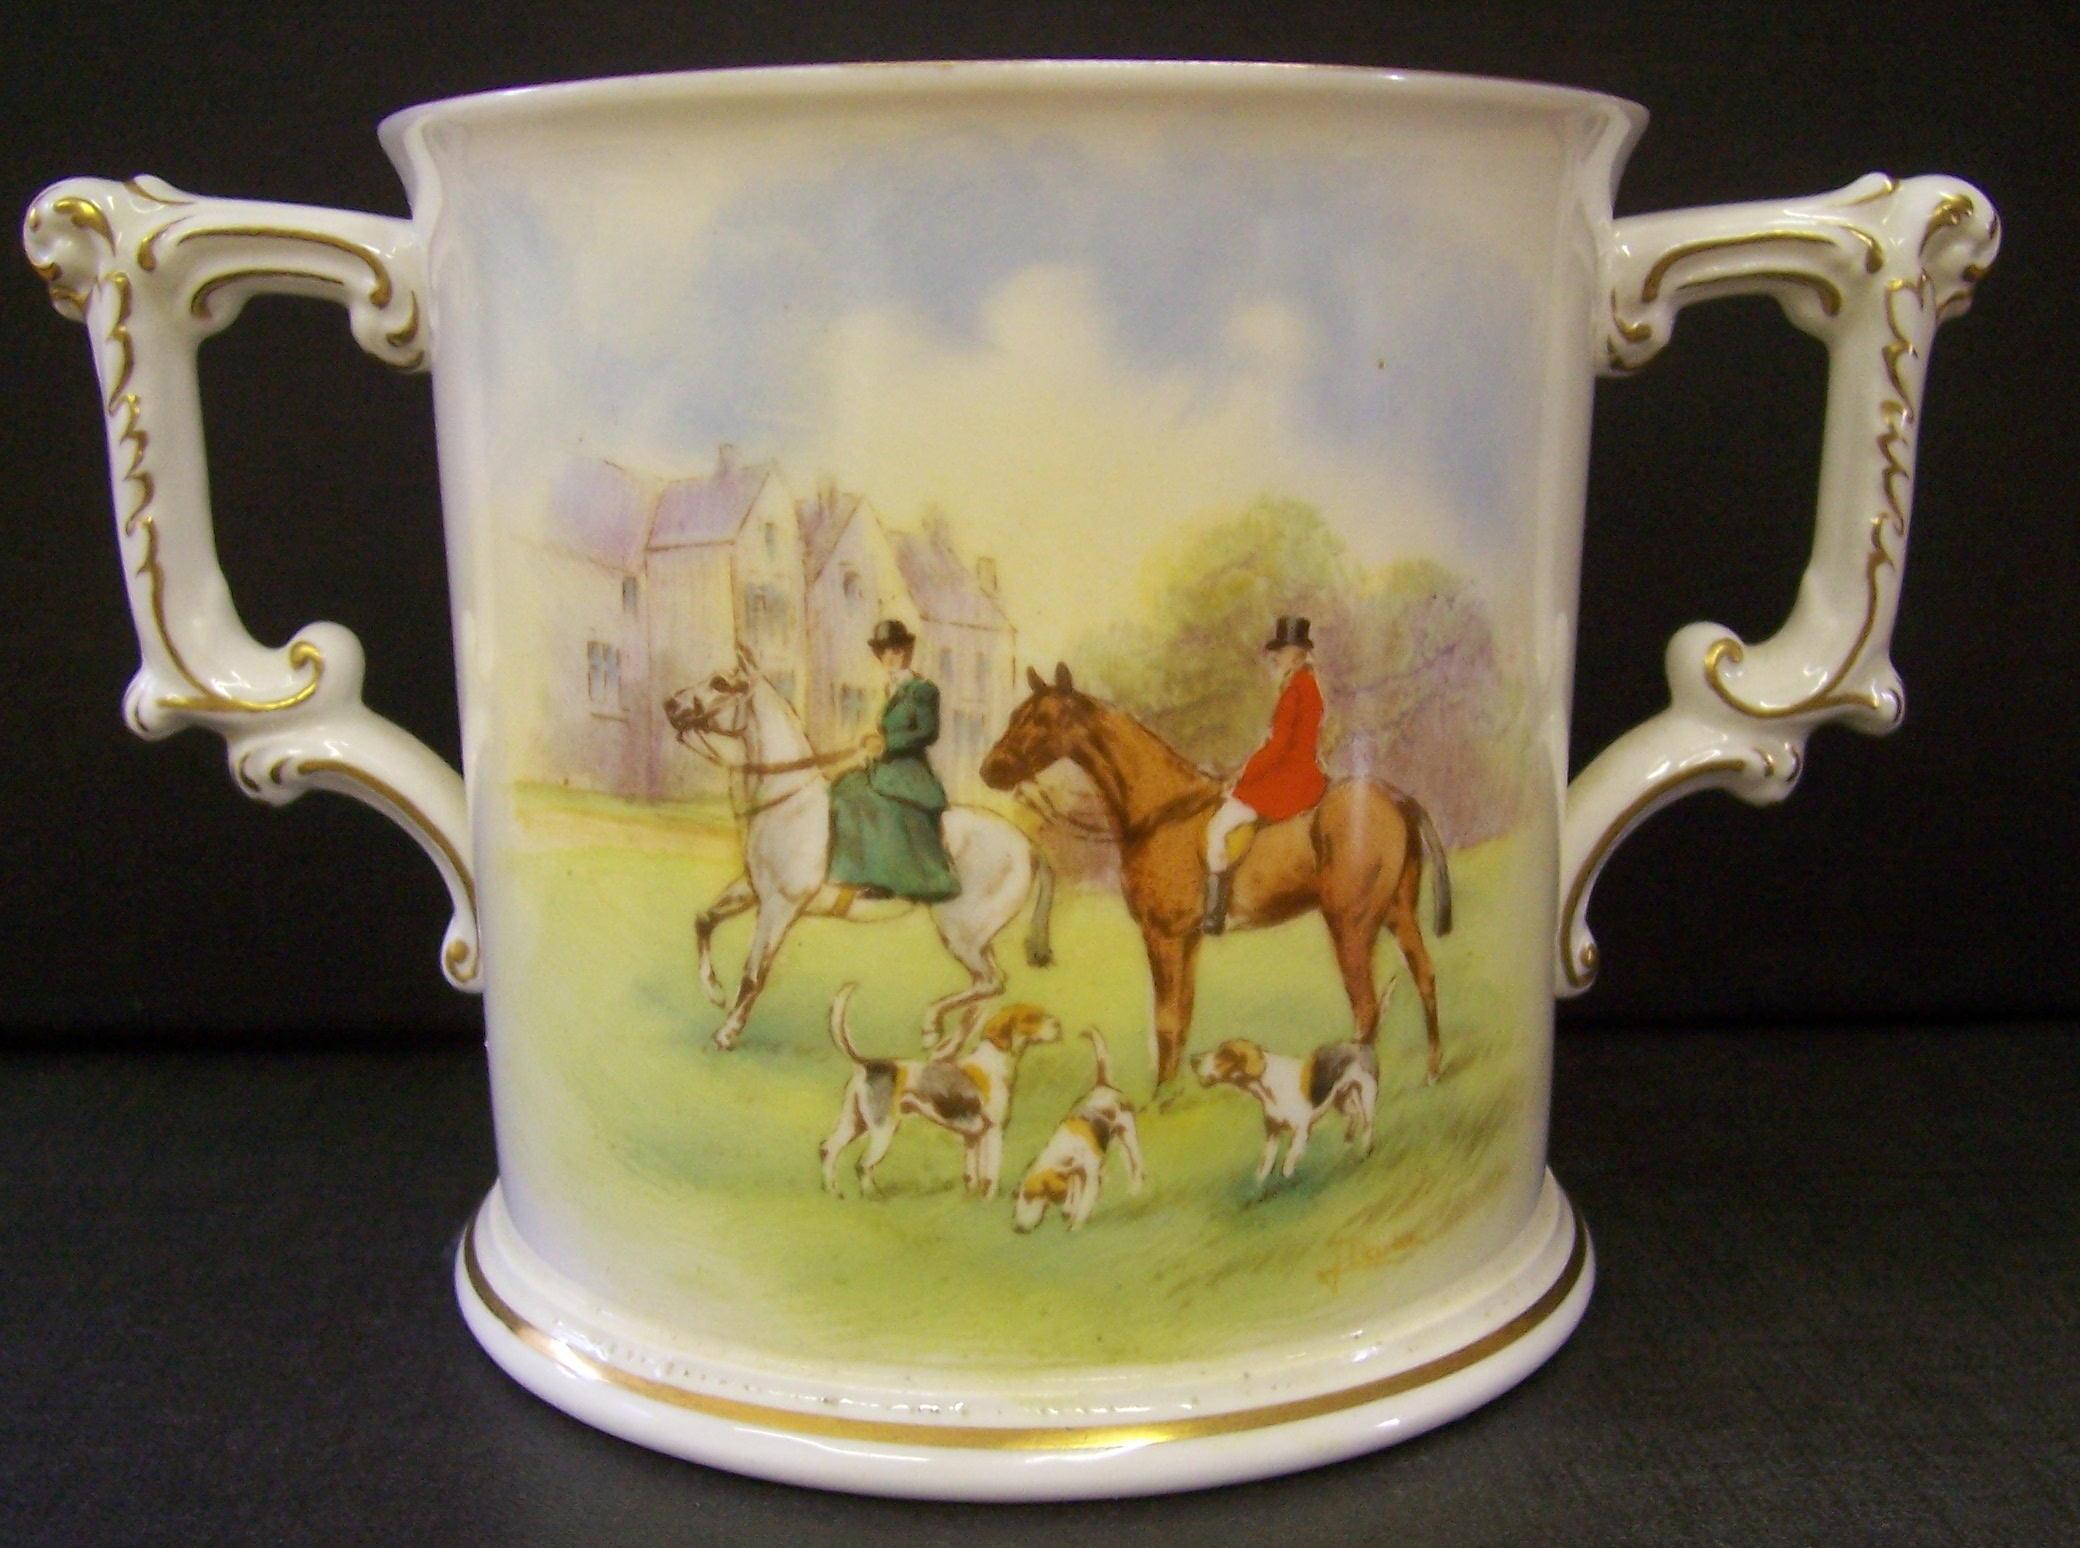 royal-crown-derby-large-loving-cup-hunting-scene